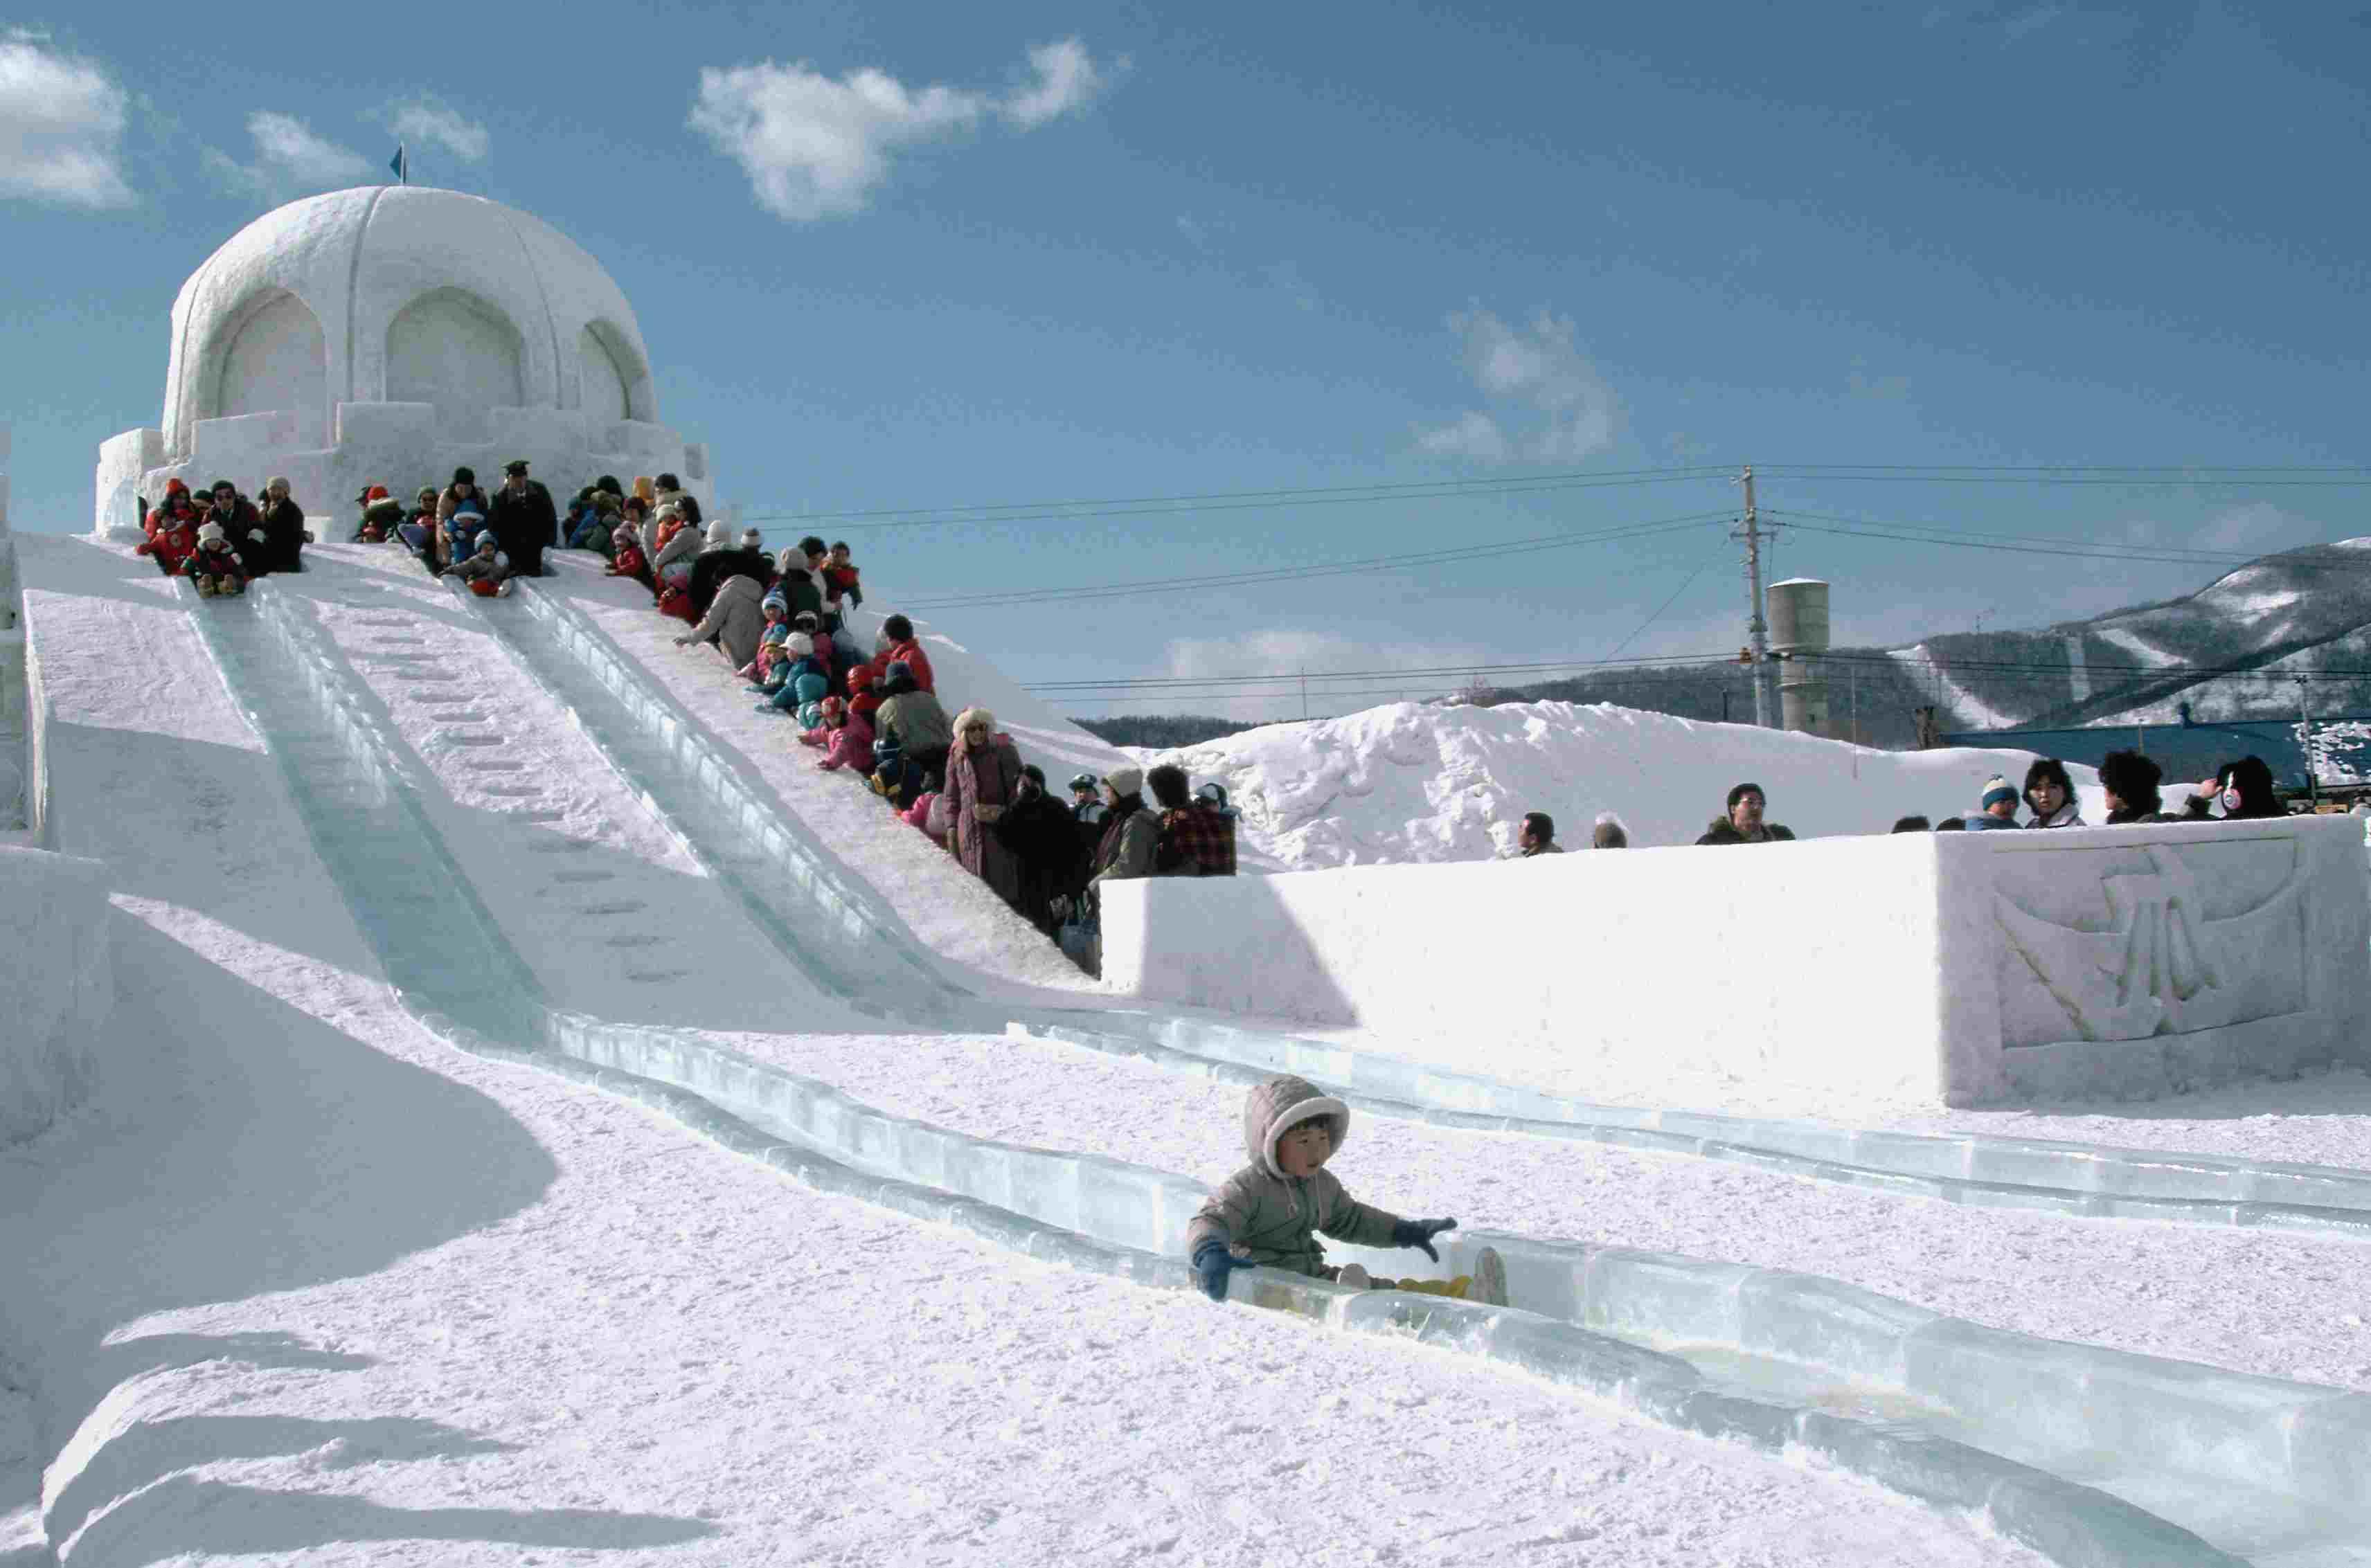 Slide of Ice at Yuki Matsuri Snow Festival